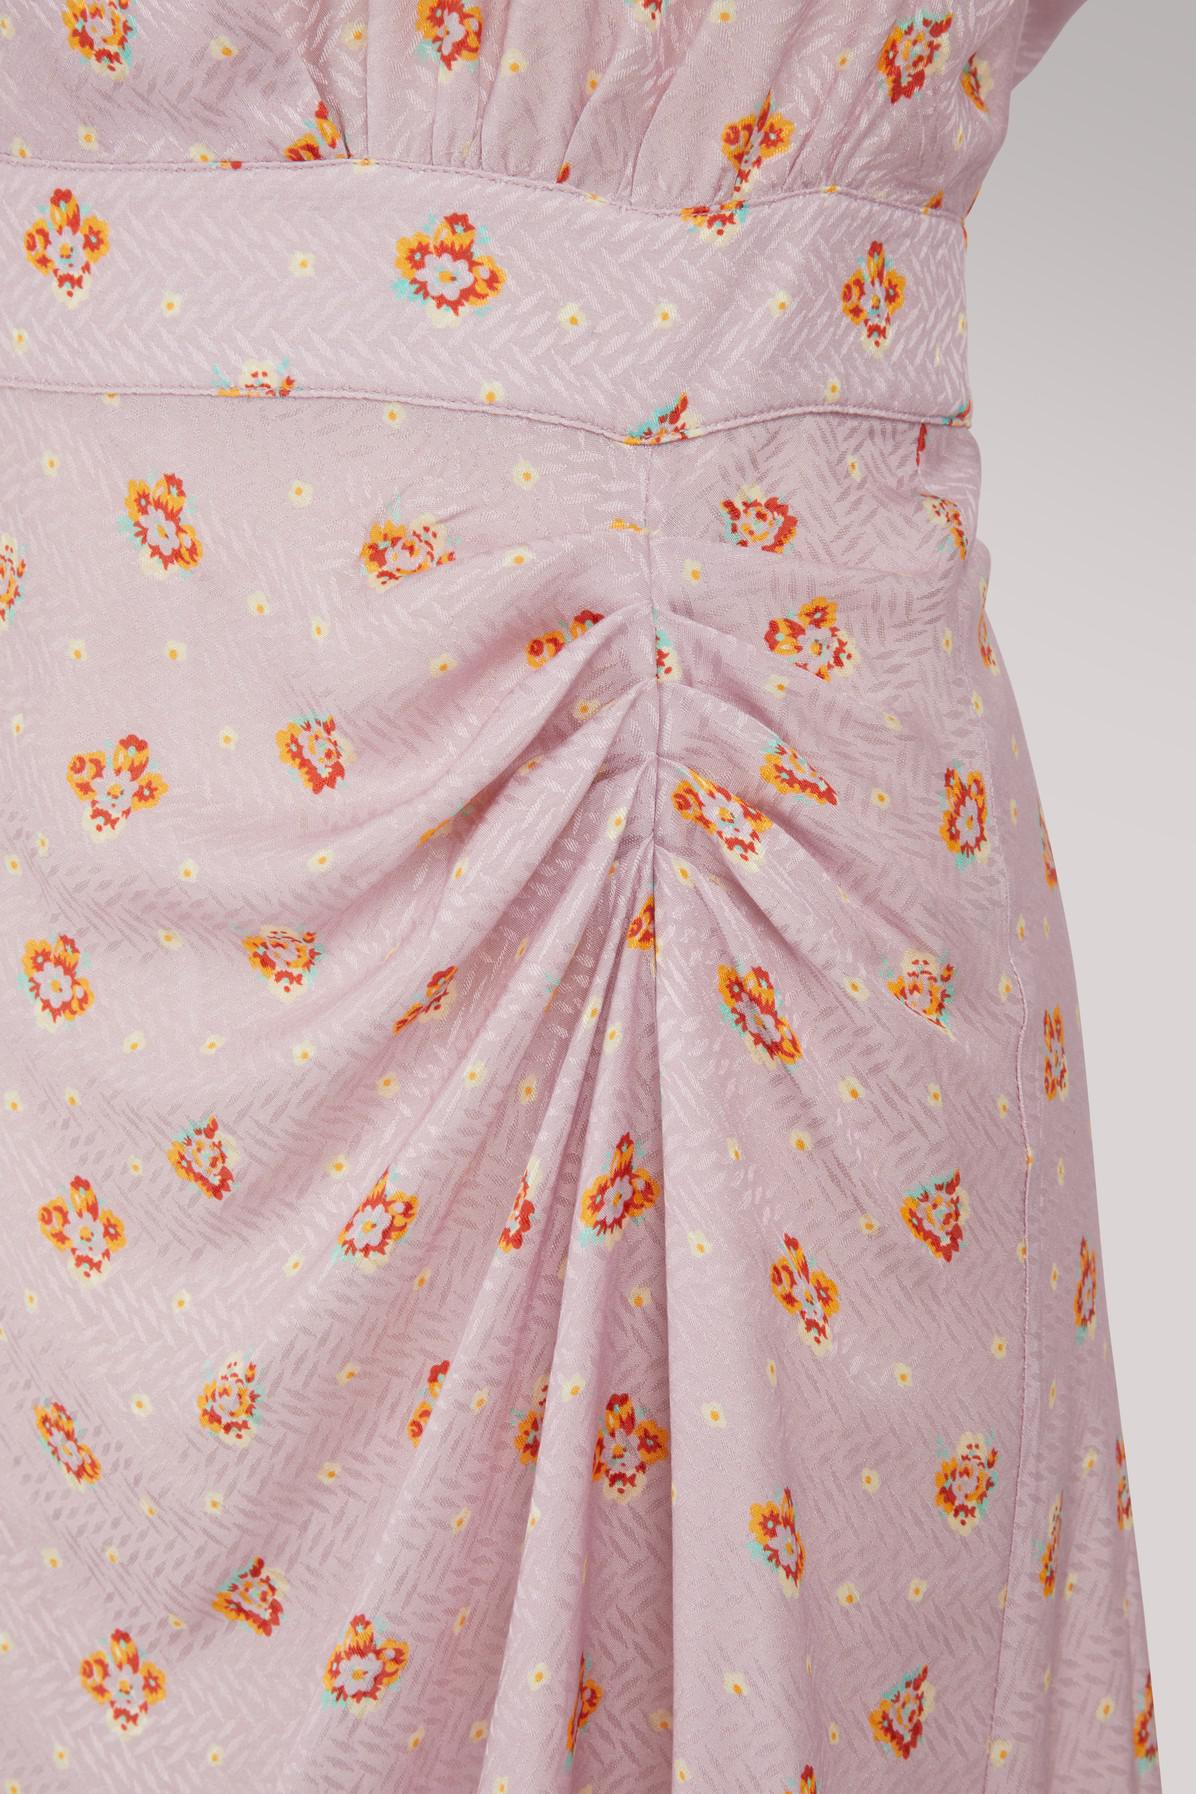 Lyst - Robe Marinette Paul   Joe en coloris Violet f433e911bbc3